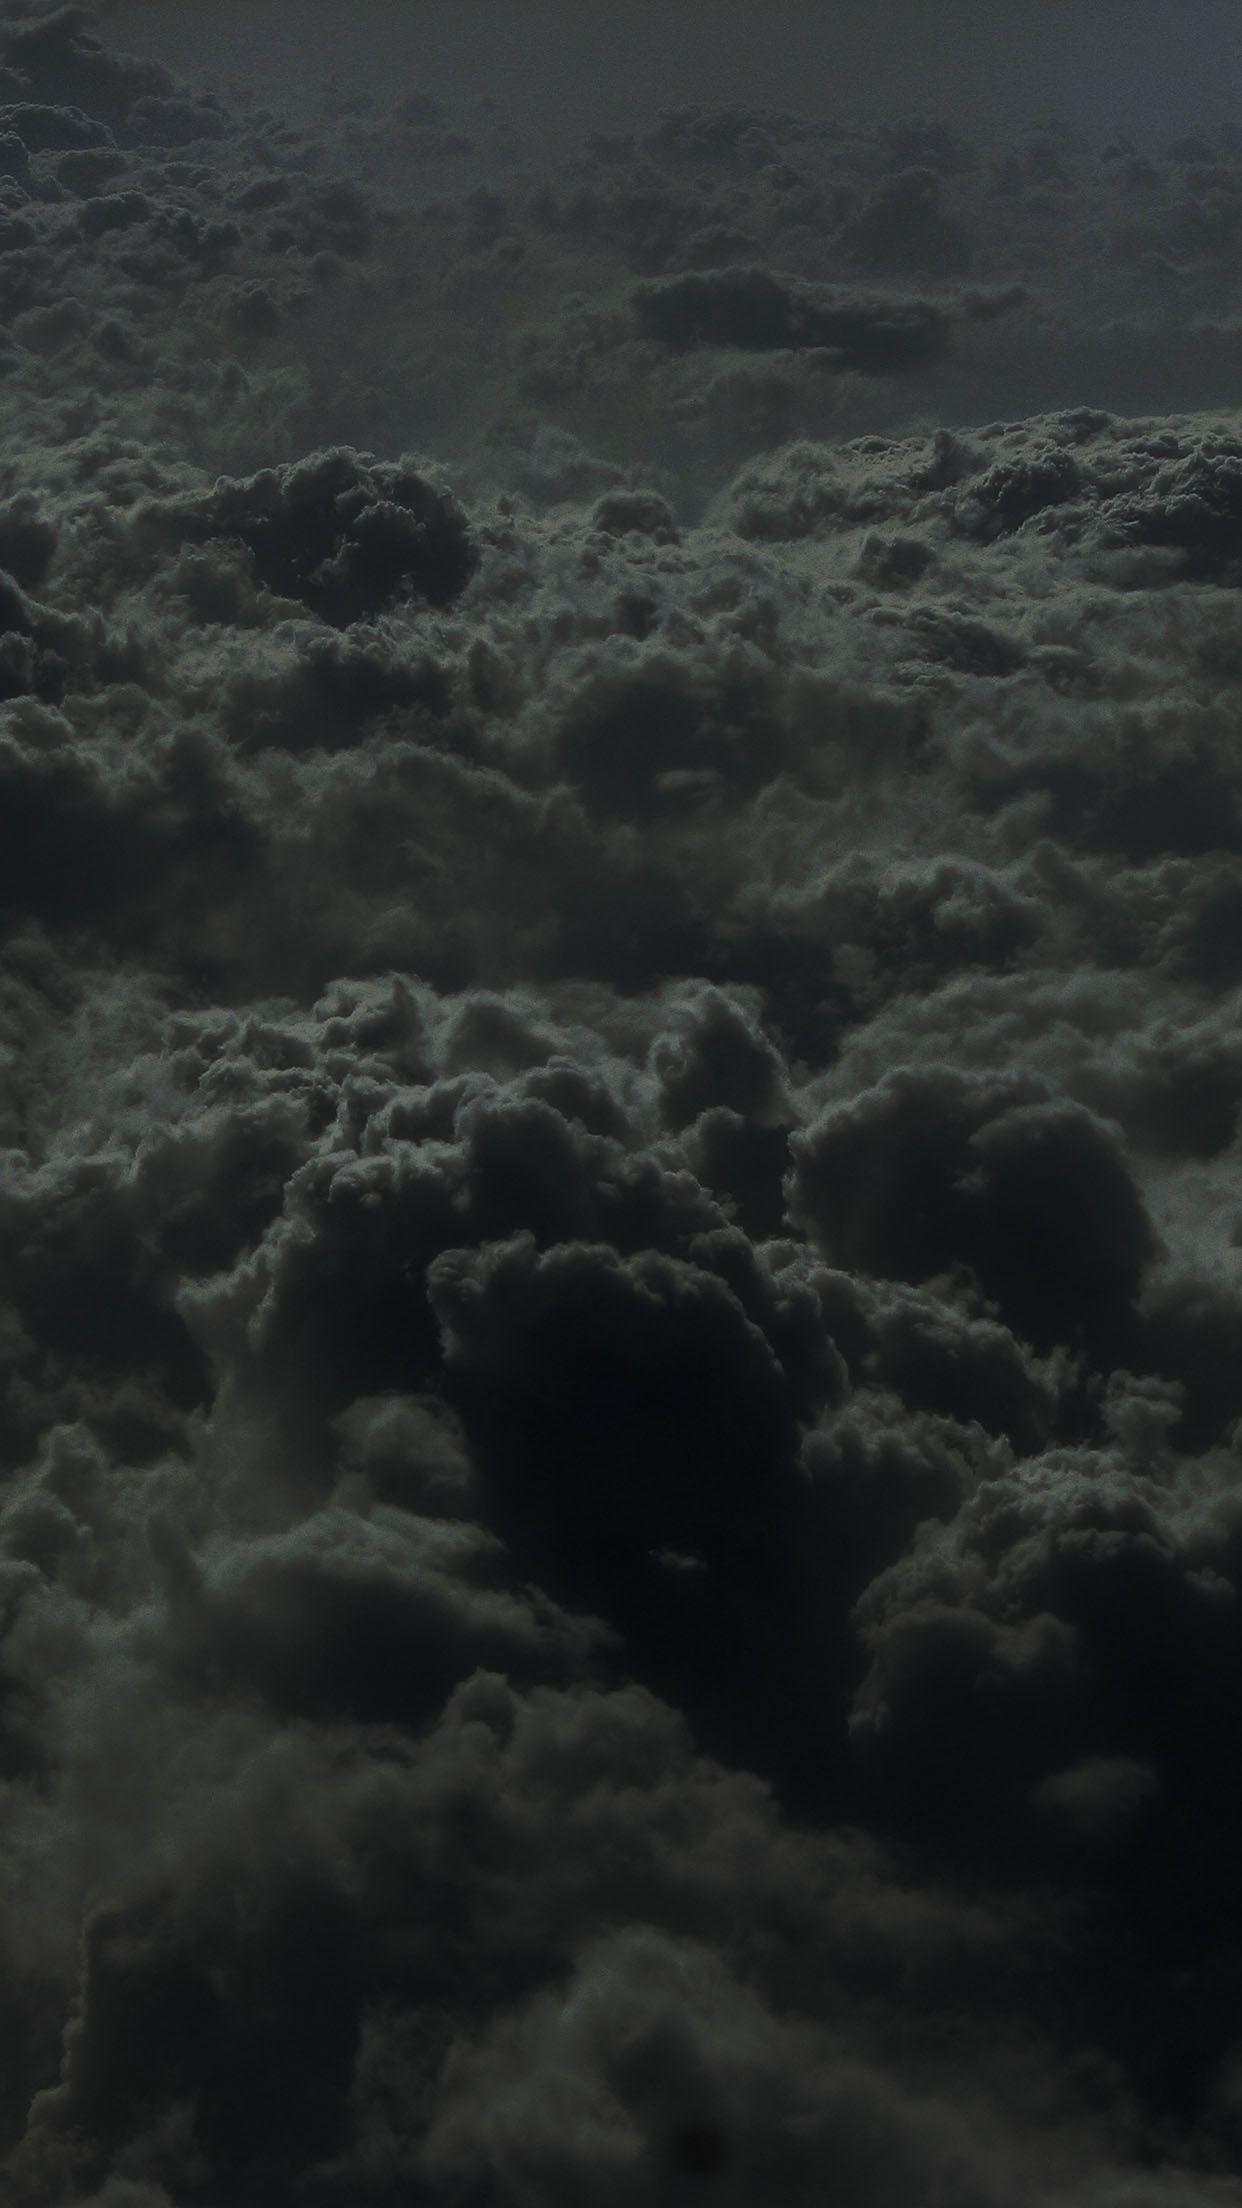 Wallpapers Dark Clouds Wallpaper Cave